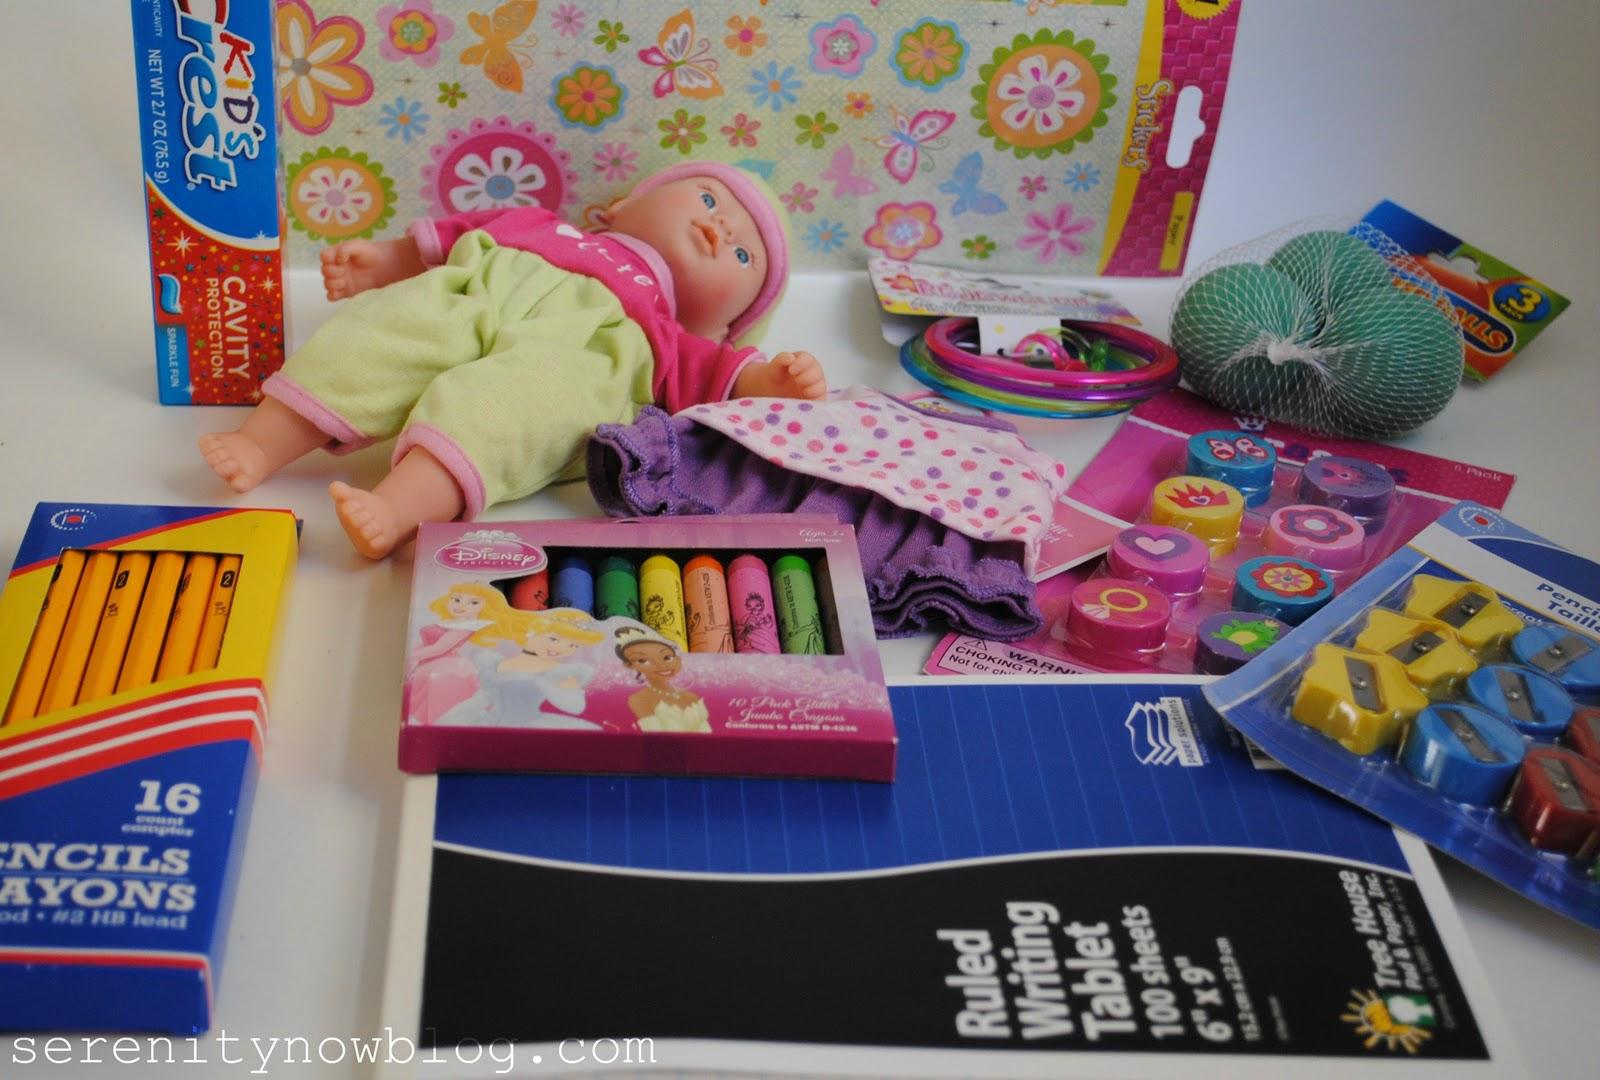 serenity now operation christmas child - Operation Christmas Child Ideas